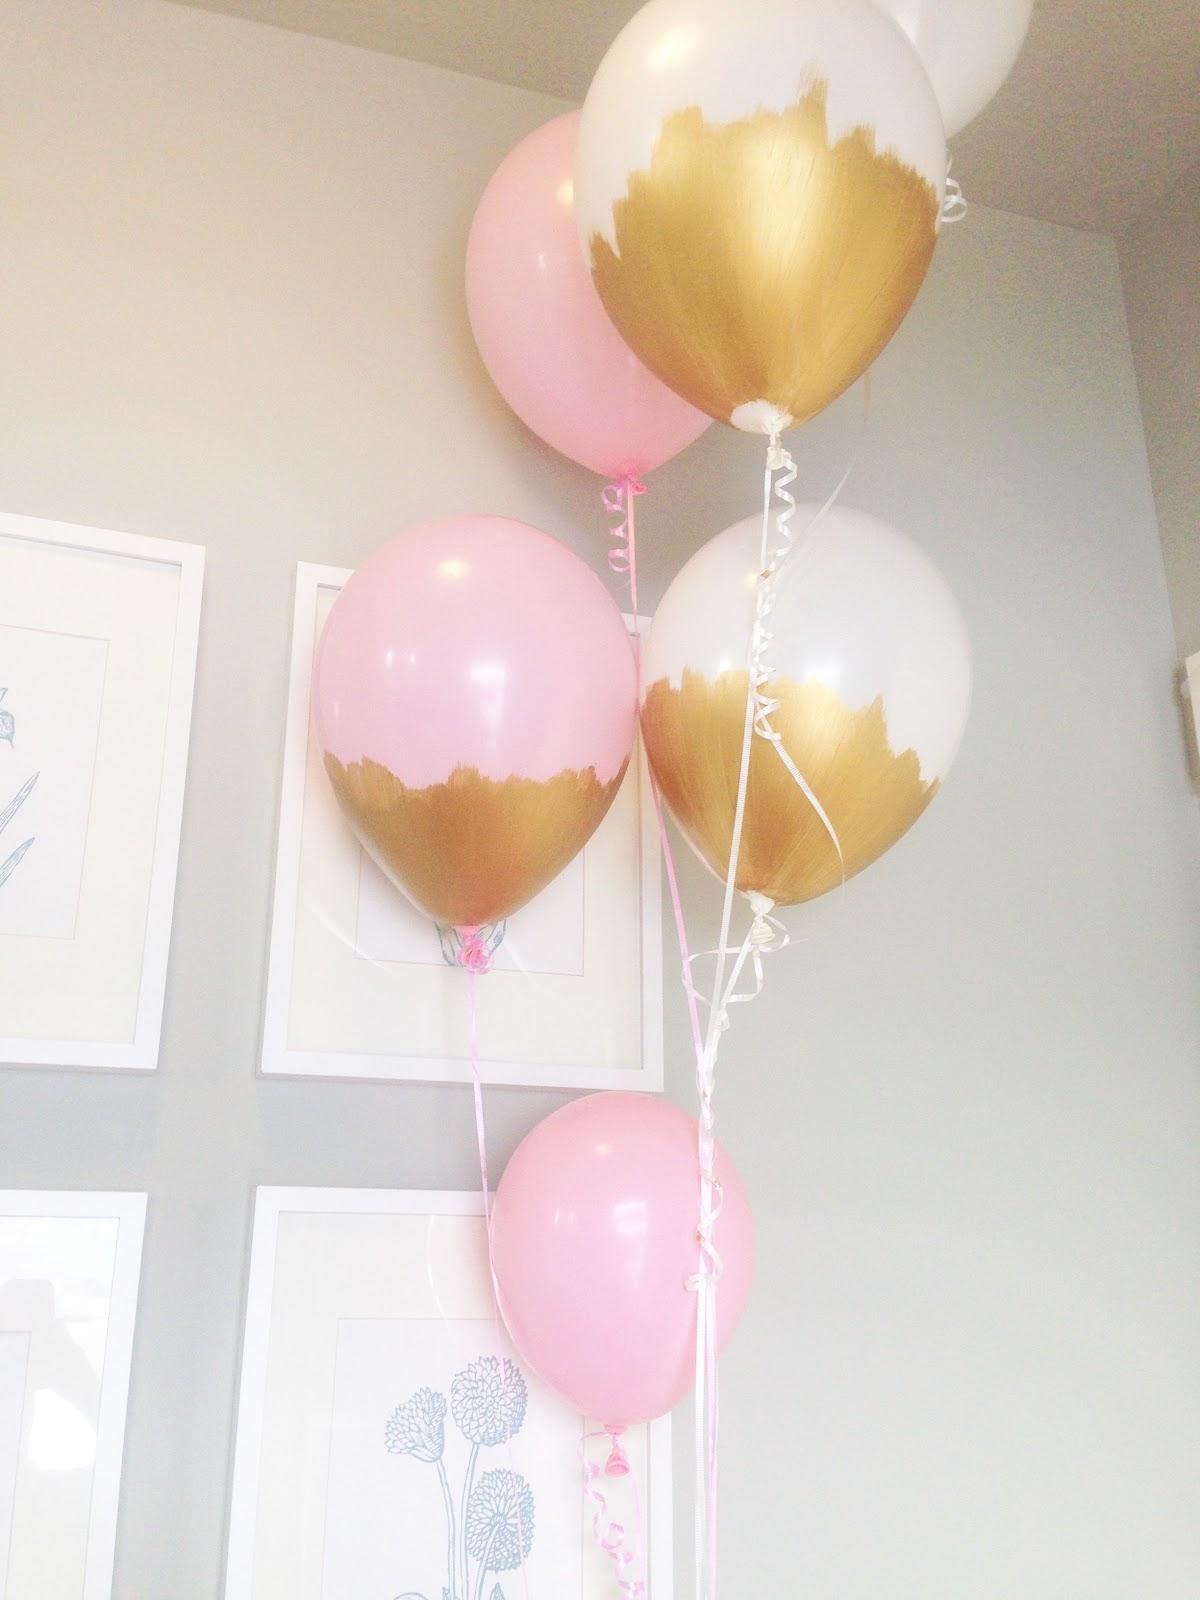 5 Unique Balloon Trends  Harlow  Thistle  Home Design